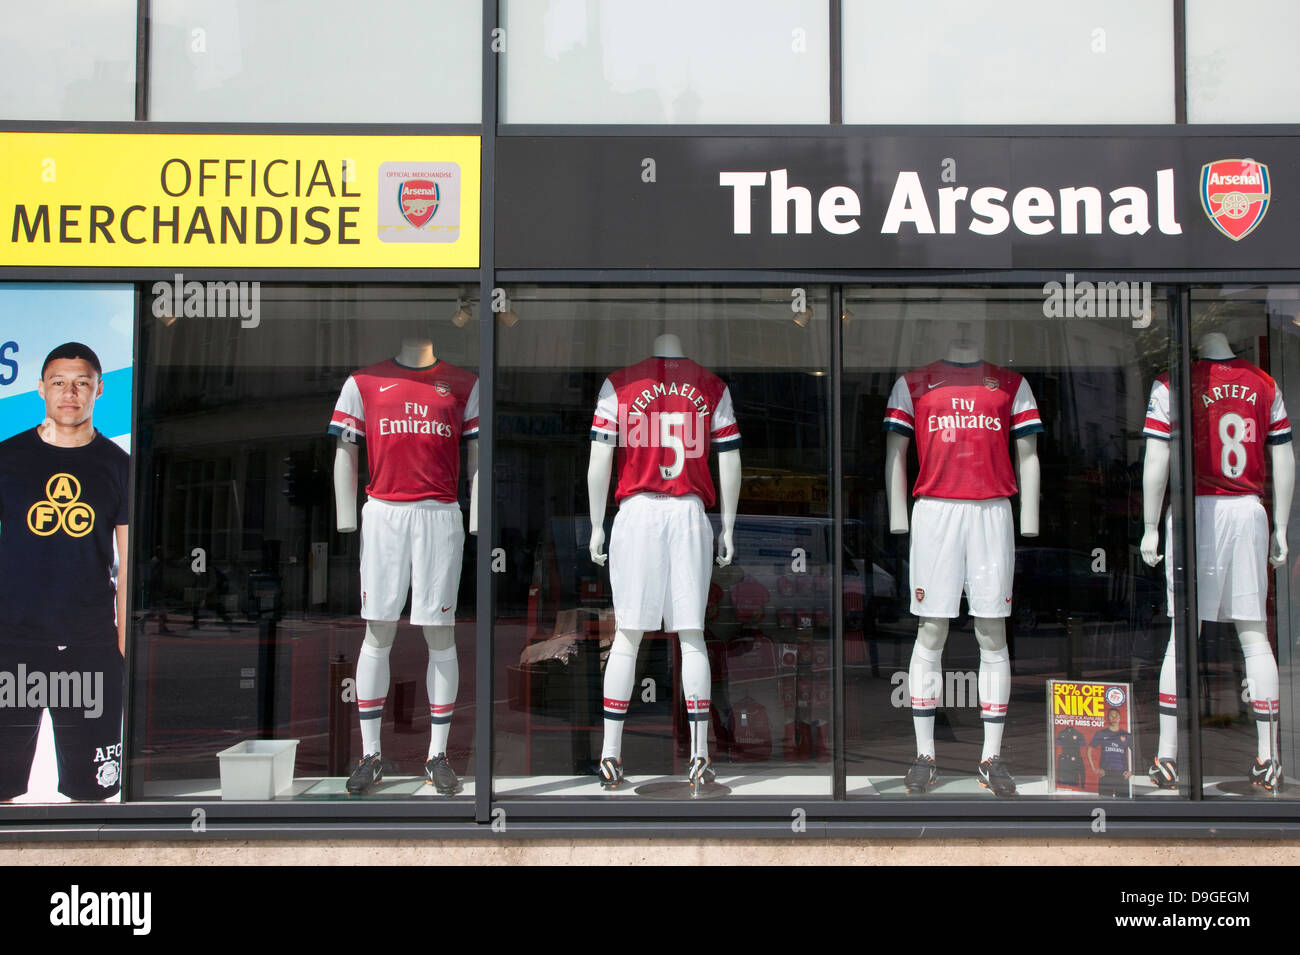 1e17eb922eb Arsenal FC official merchandise shop, Finsbury Park, London Stock ...